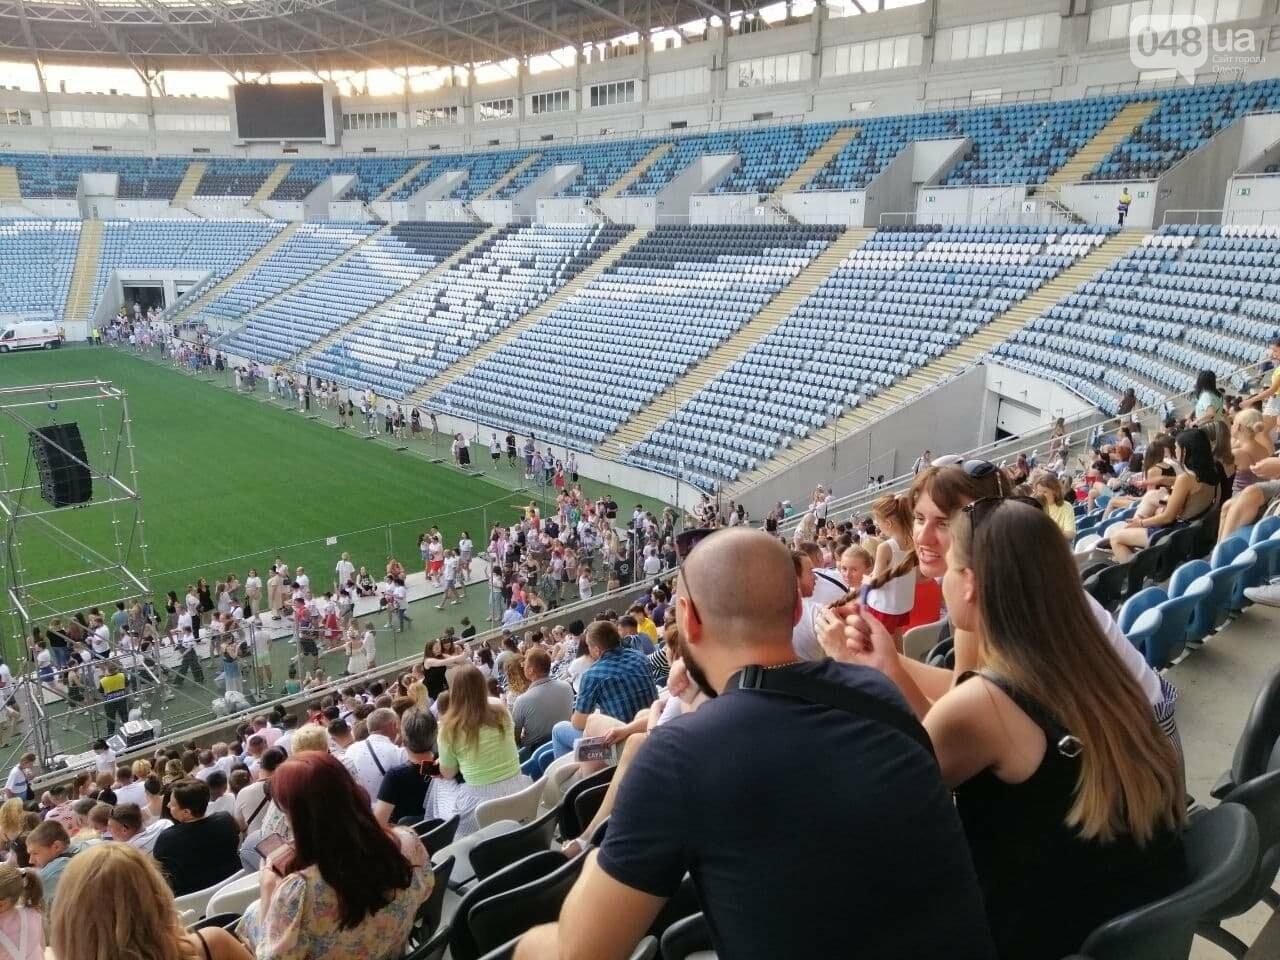 Монатик на стадионе спел все песни об Одессе, - ФОТО, ВИДЕО, фото-5